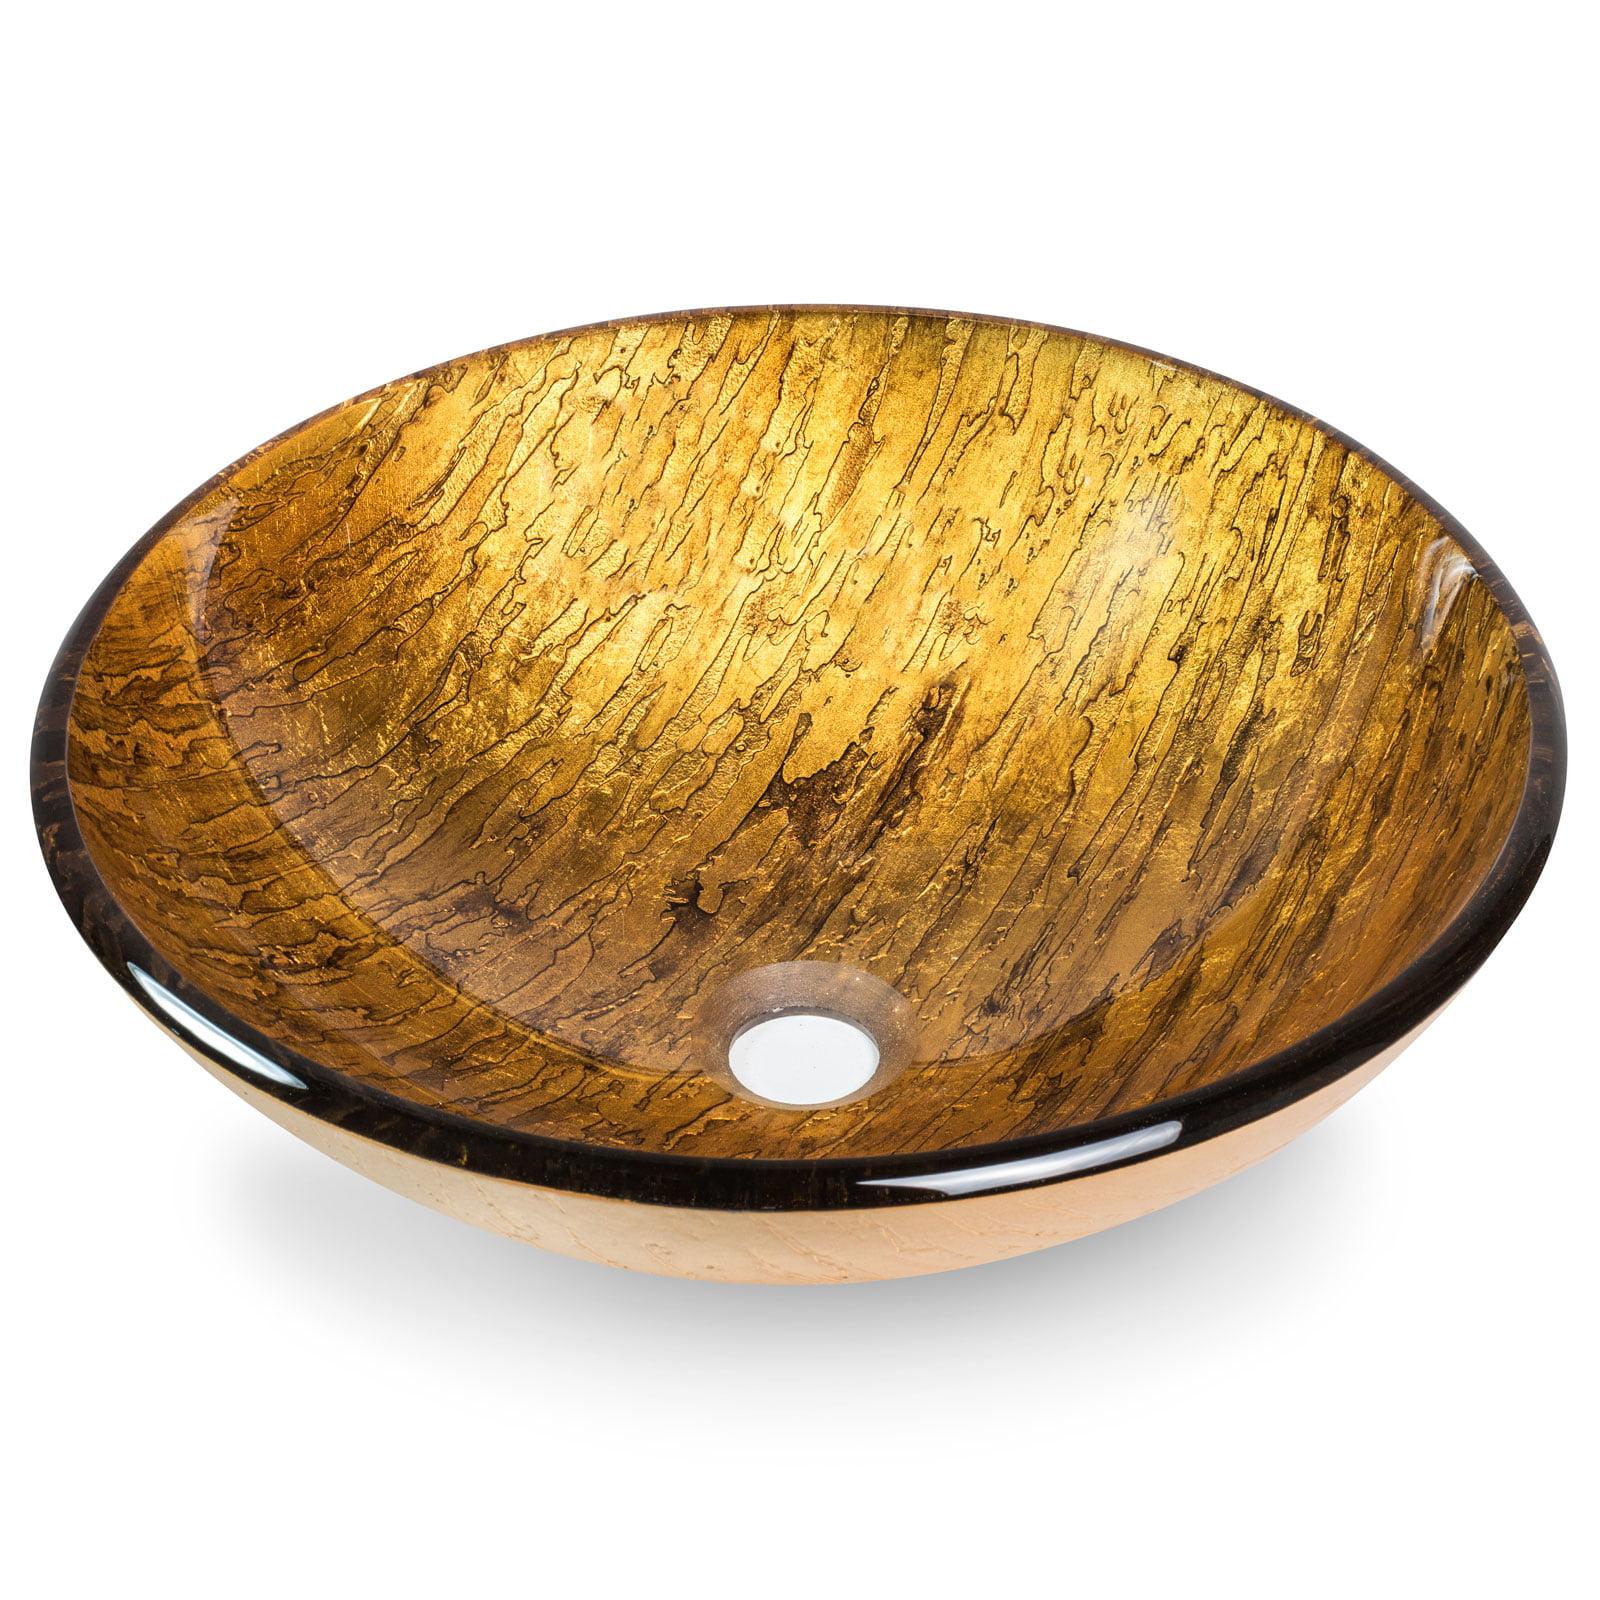 Miligor?? Modern Glass Vessel Sink - Above Counter Bathroom Vanity Basin Bowl - Round Gold